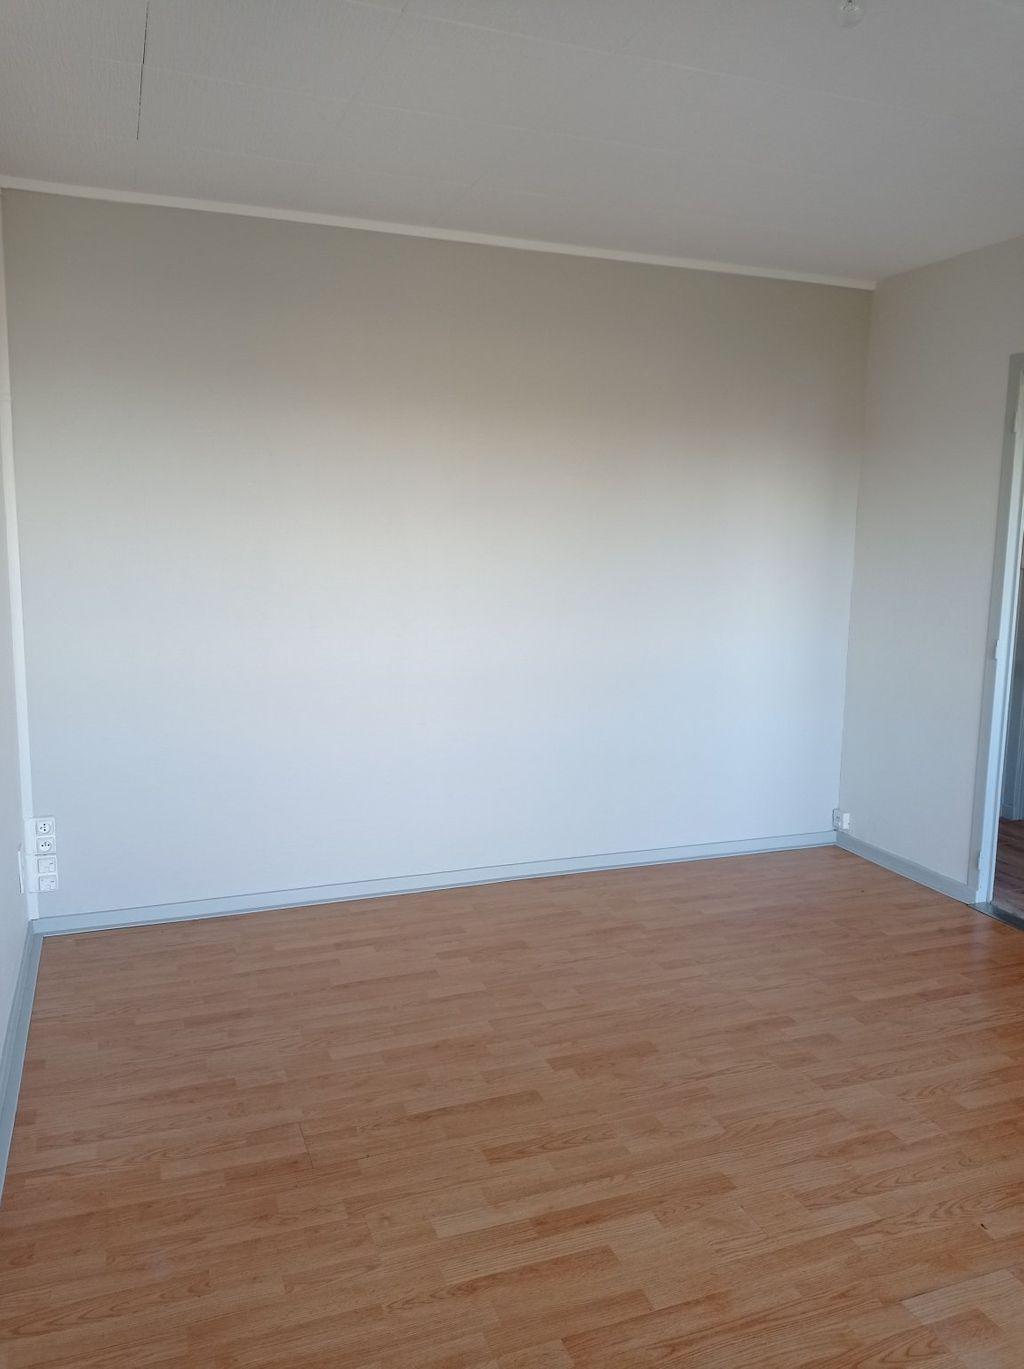 Achat appartement 1 pièce(s) Vichy